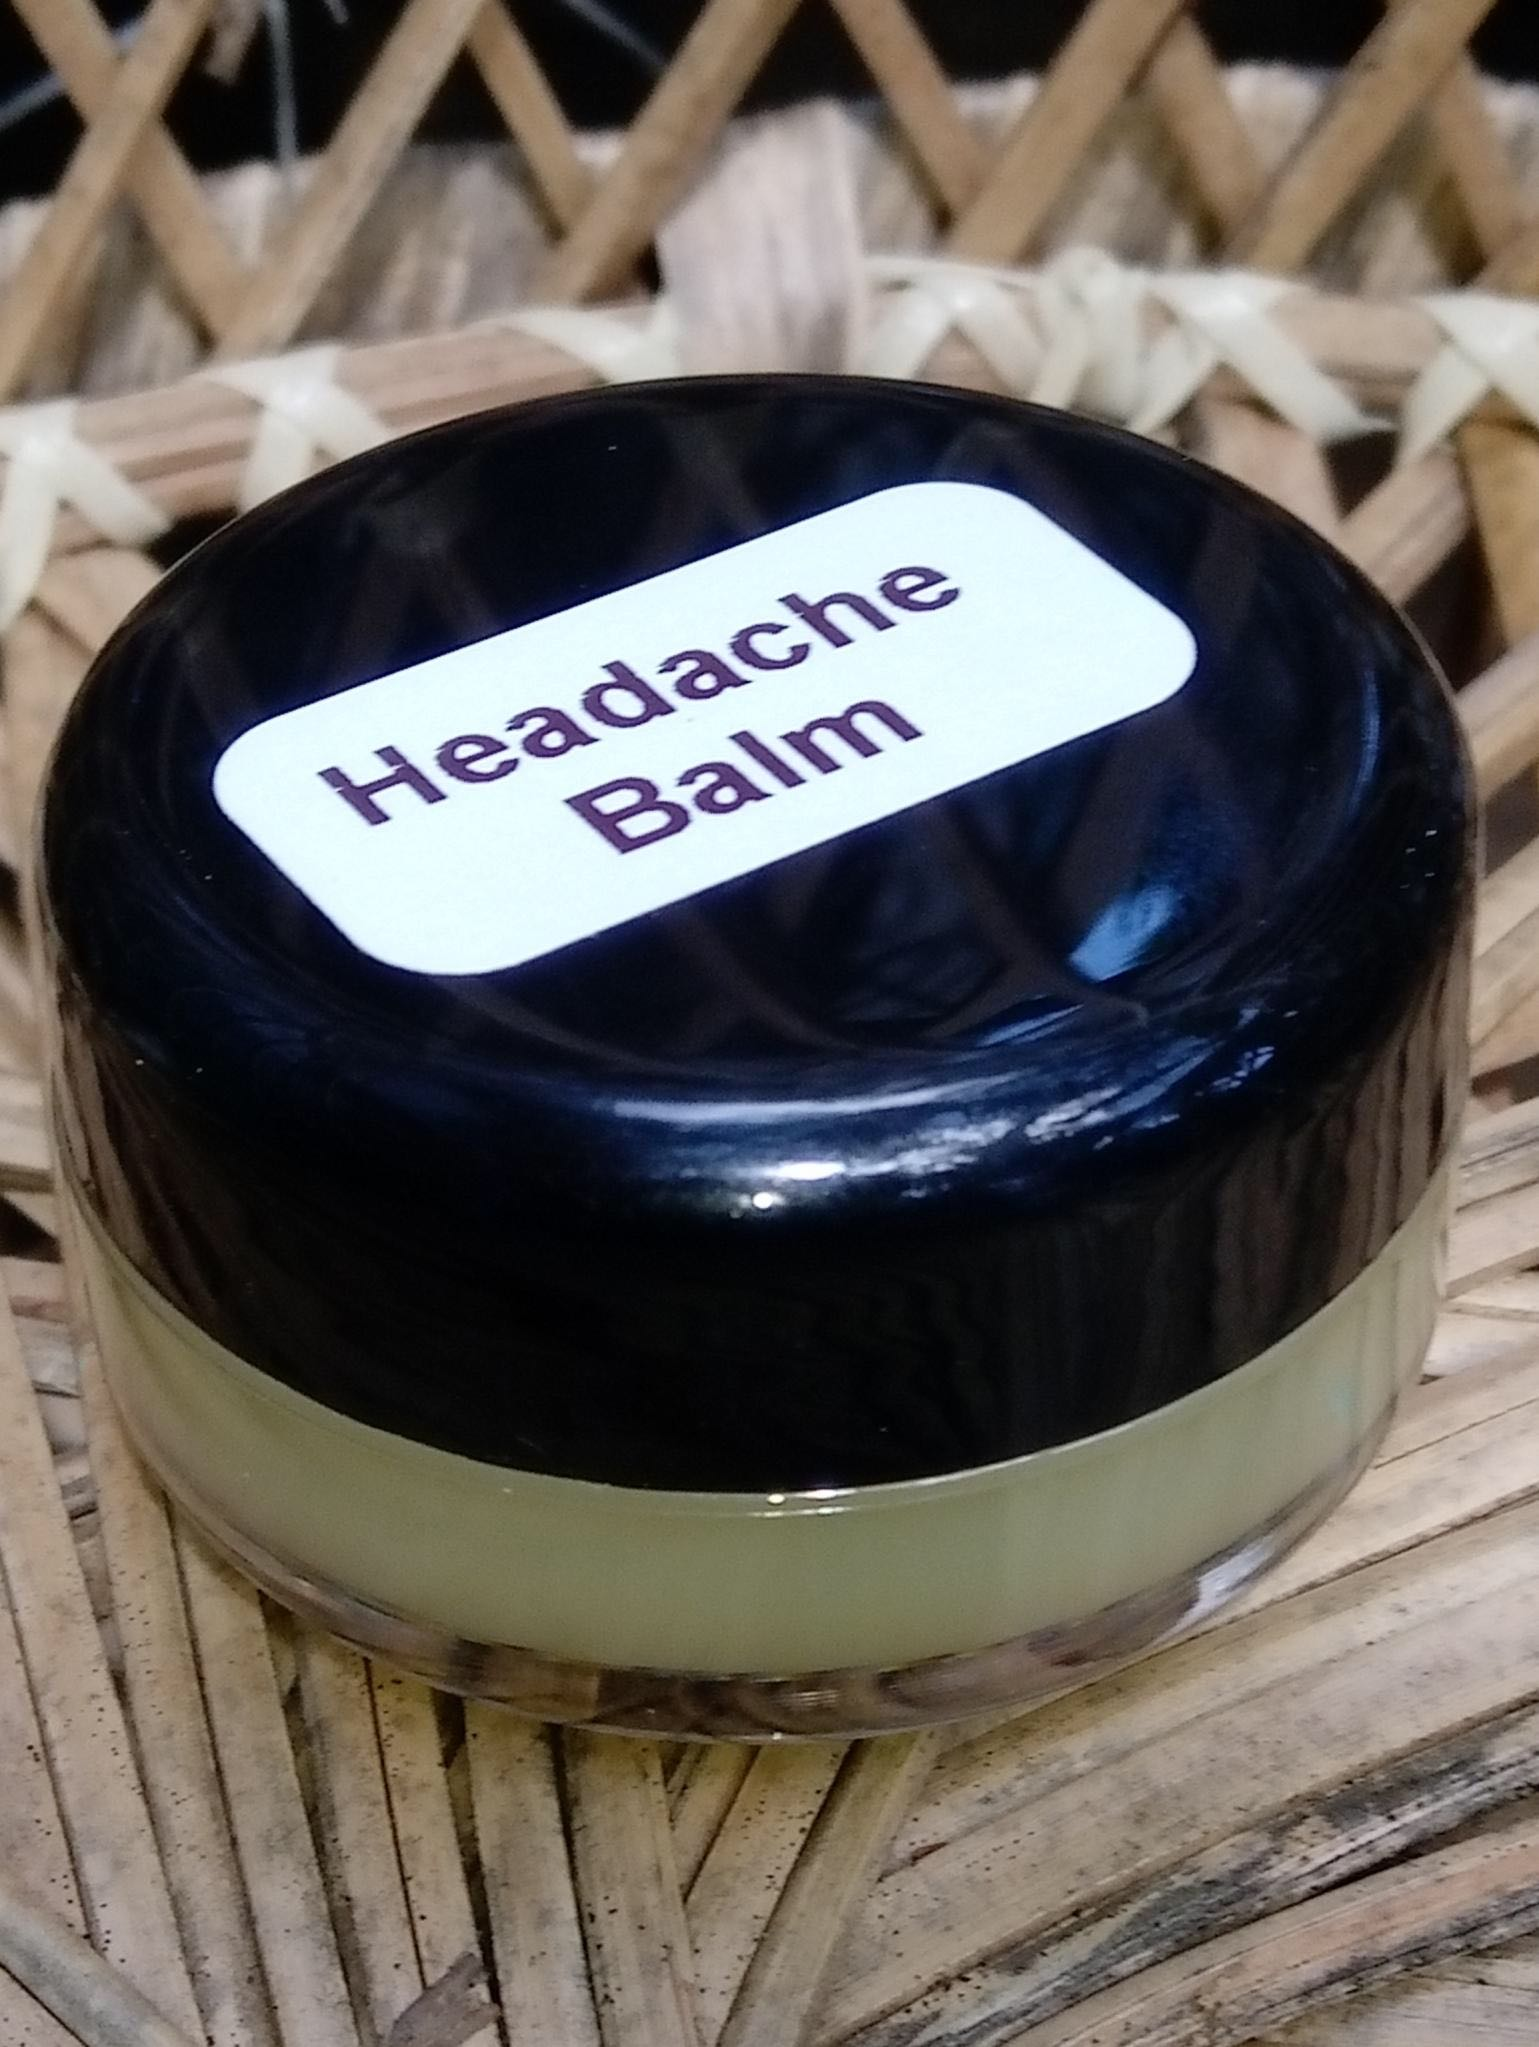 Photograph of Headache Balm product